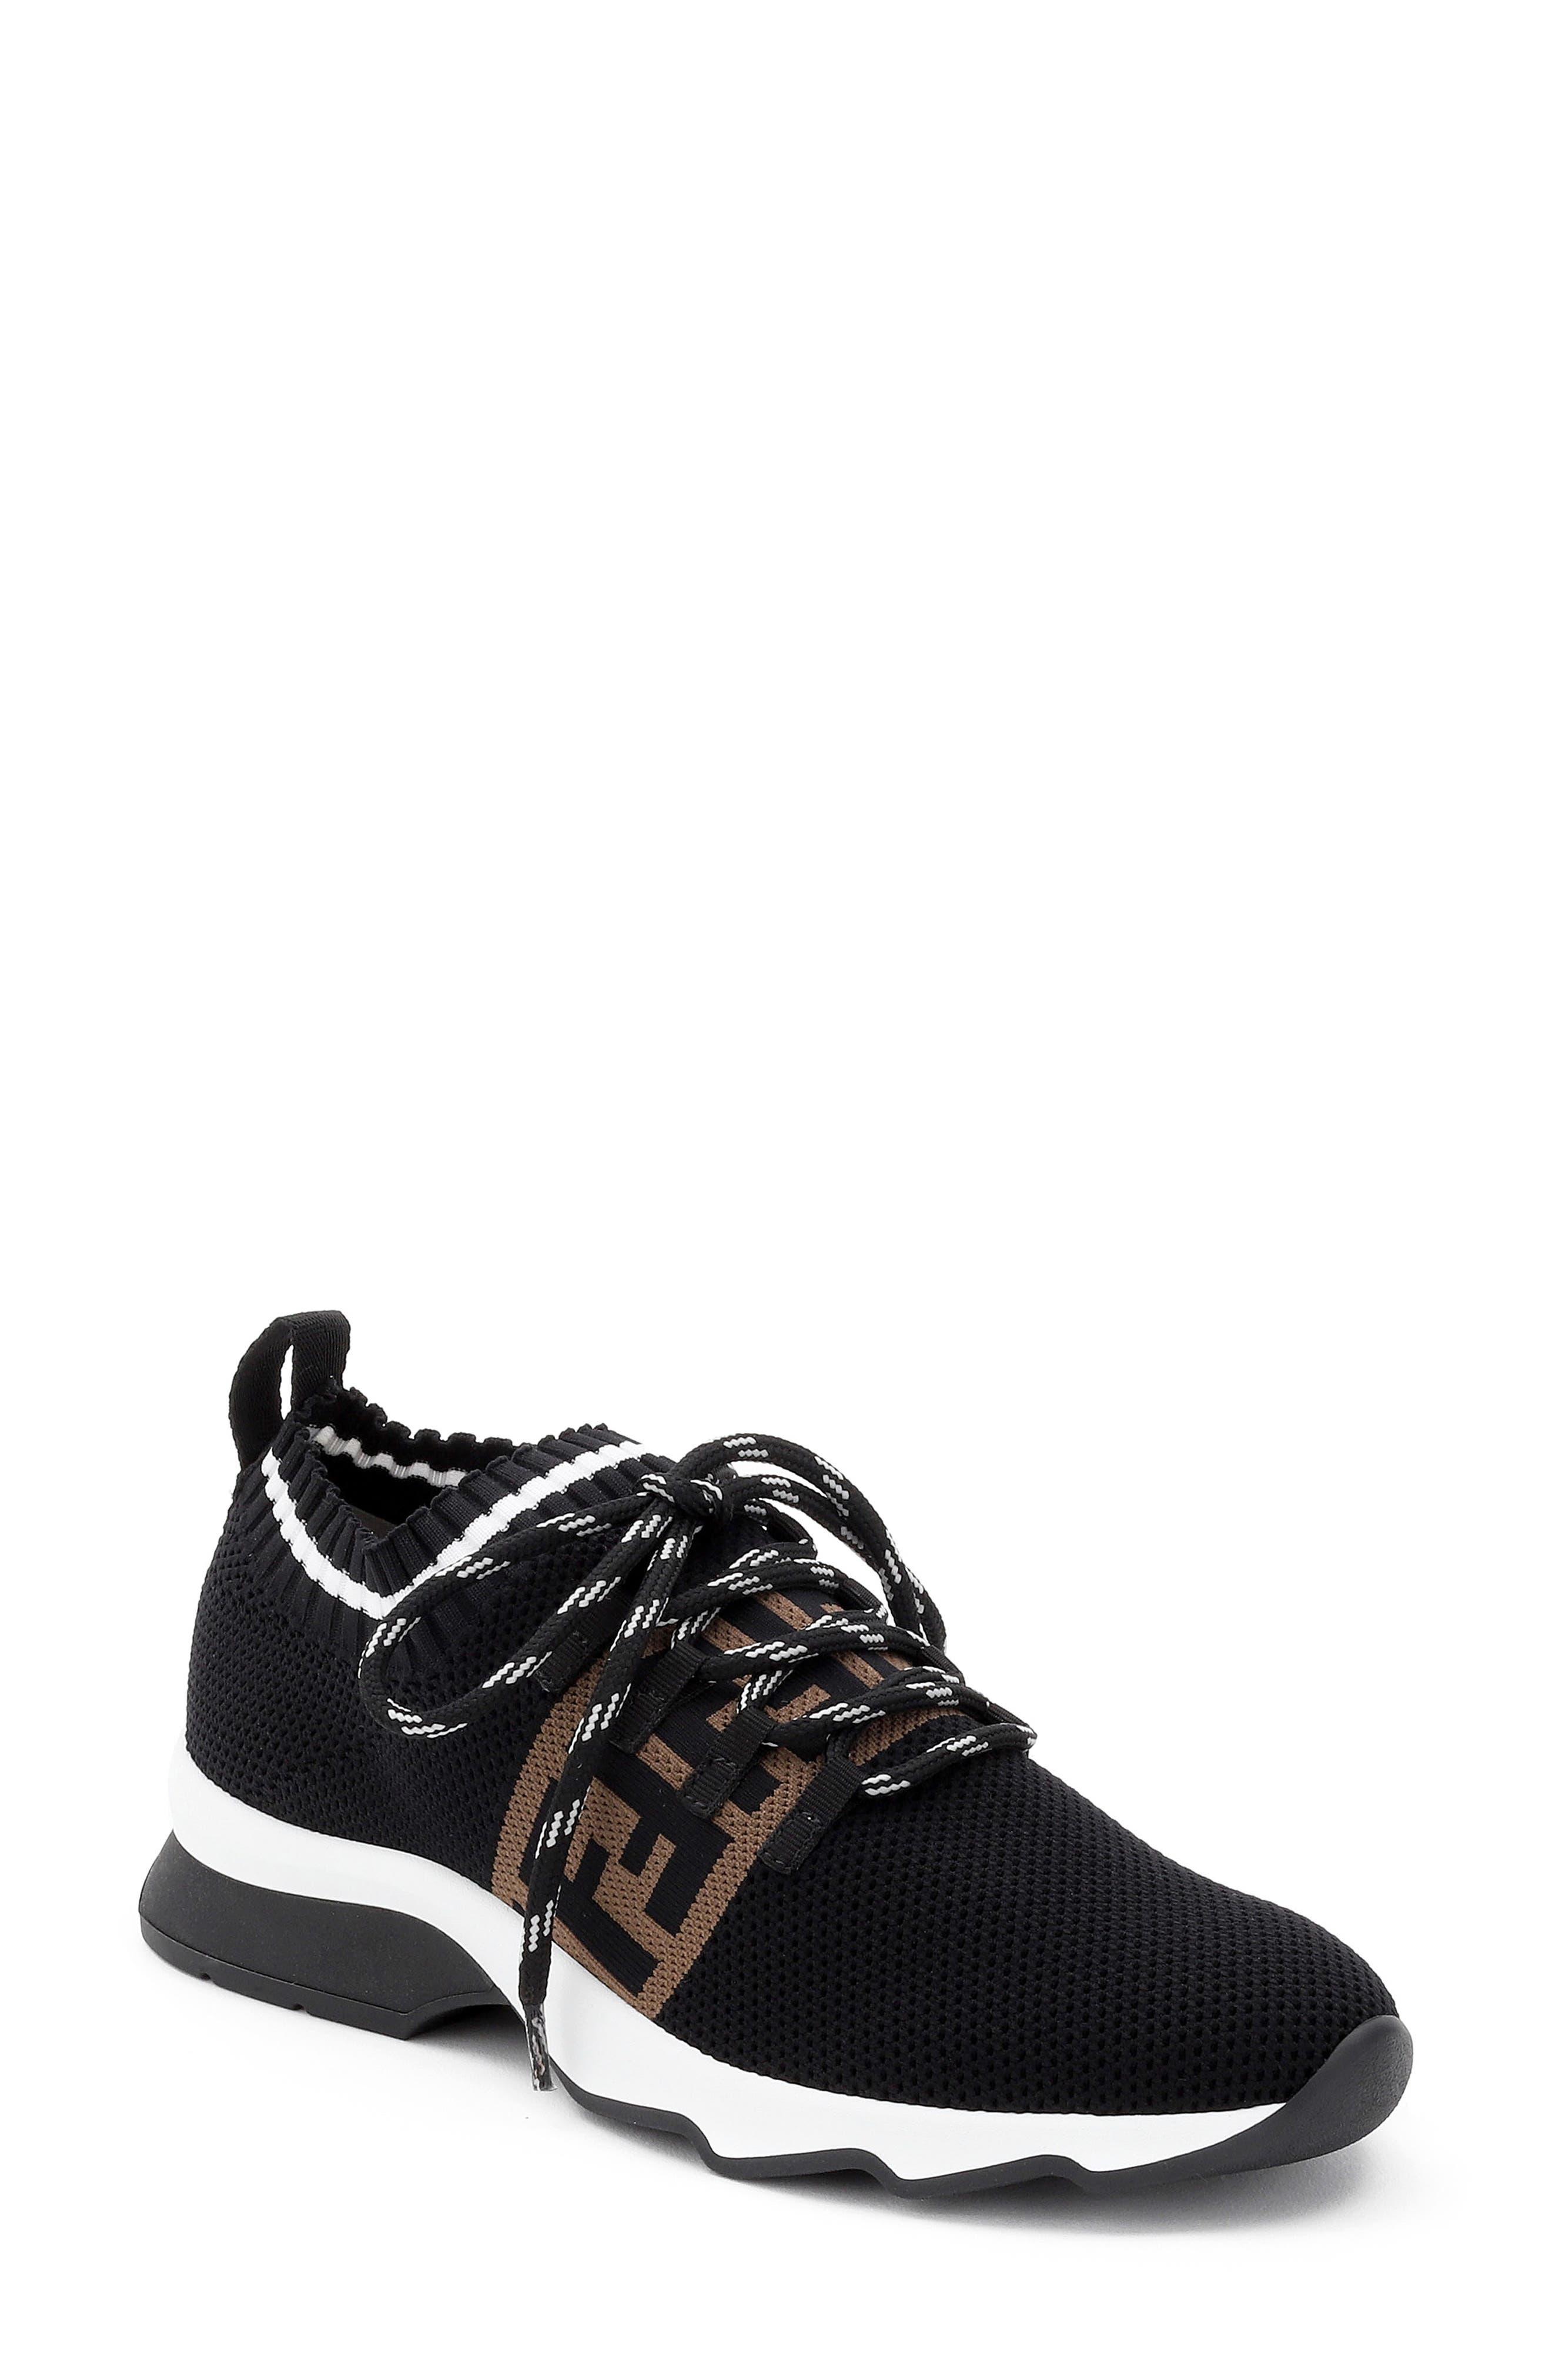 Women's Fendi Shoes | Nordstrom